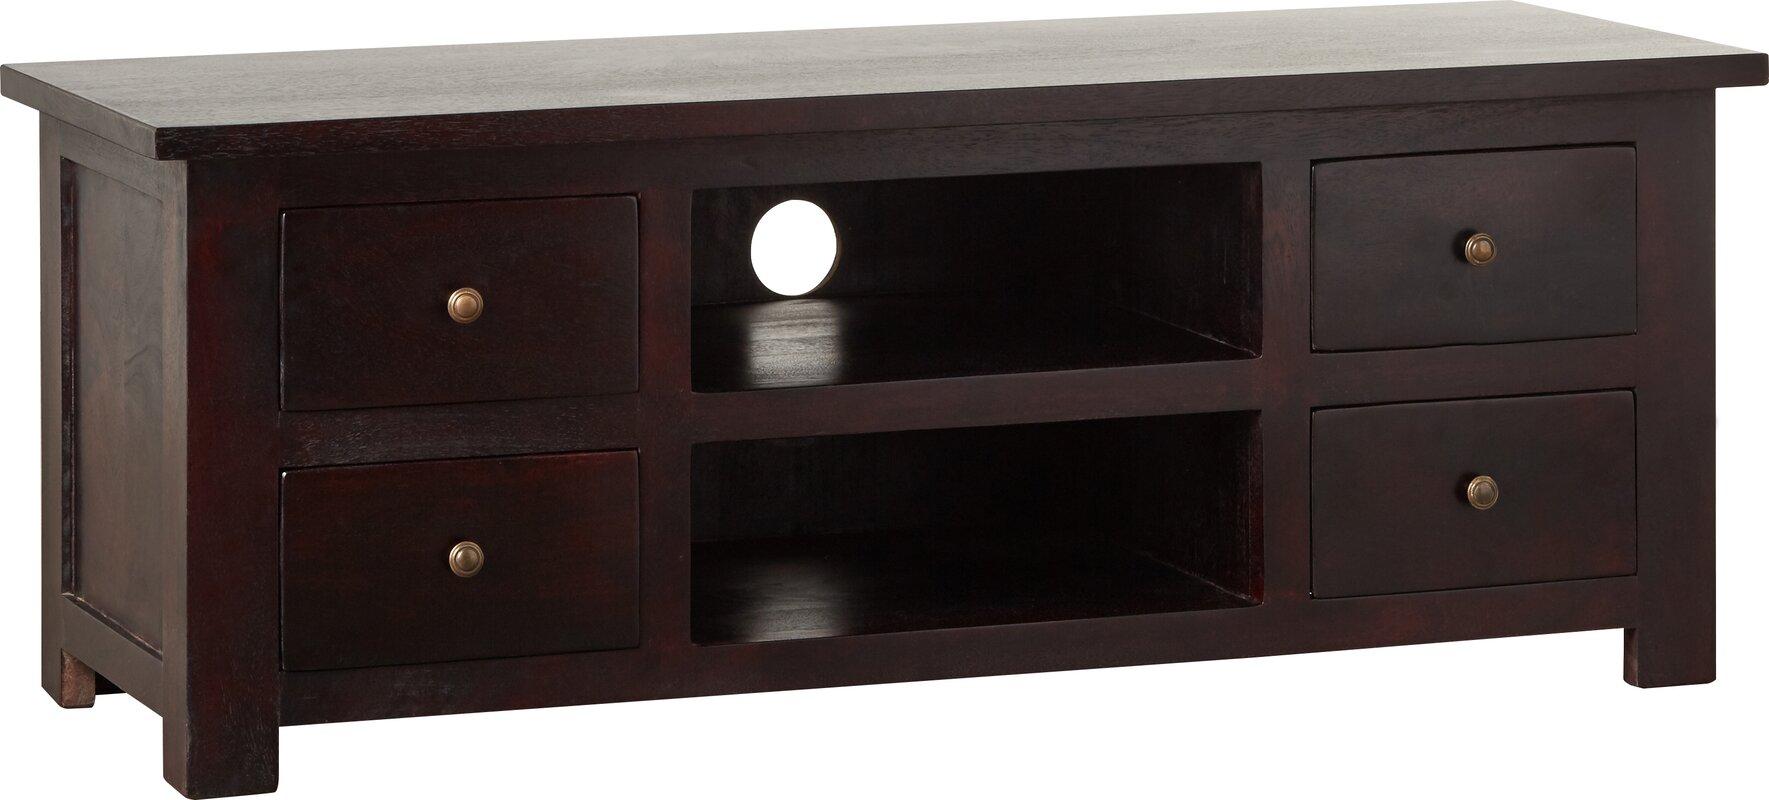 classicliving tv schrank stockholm f r tvs bis zu 78 bewertungen. Black Bedroom Furniture Sets. Home Design Ideas